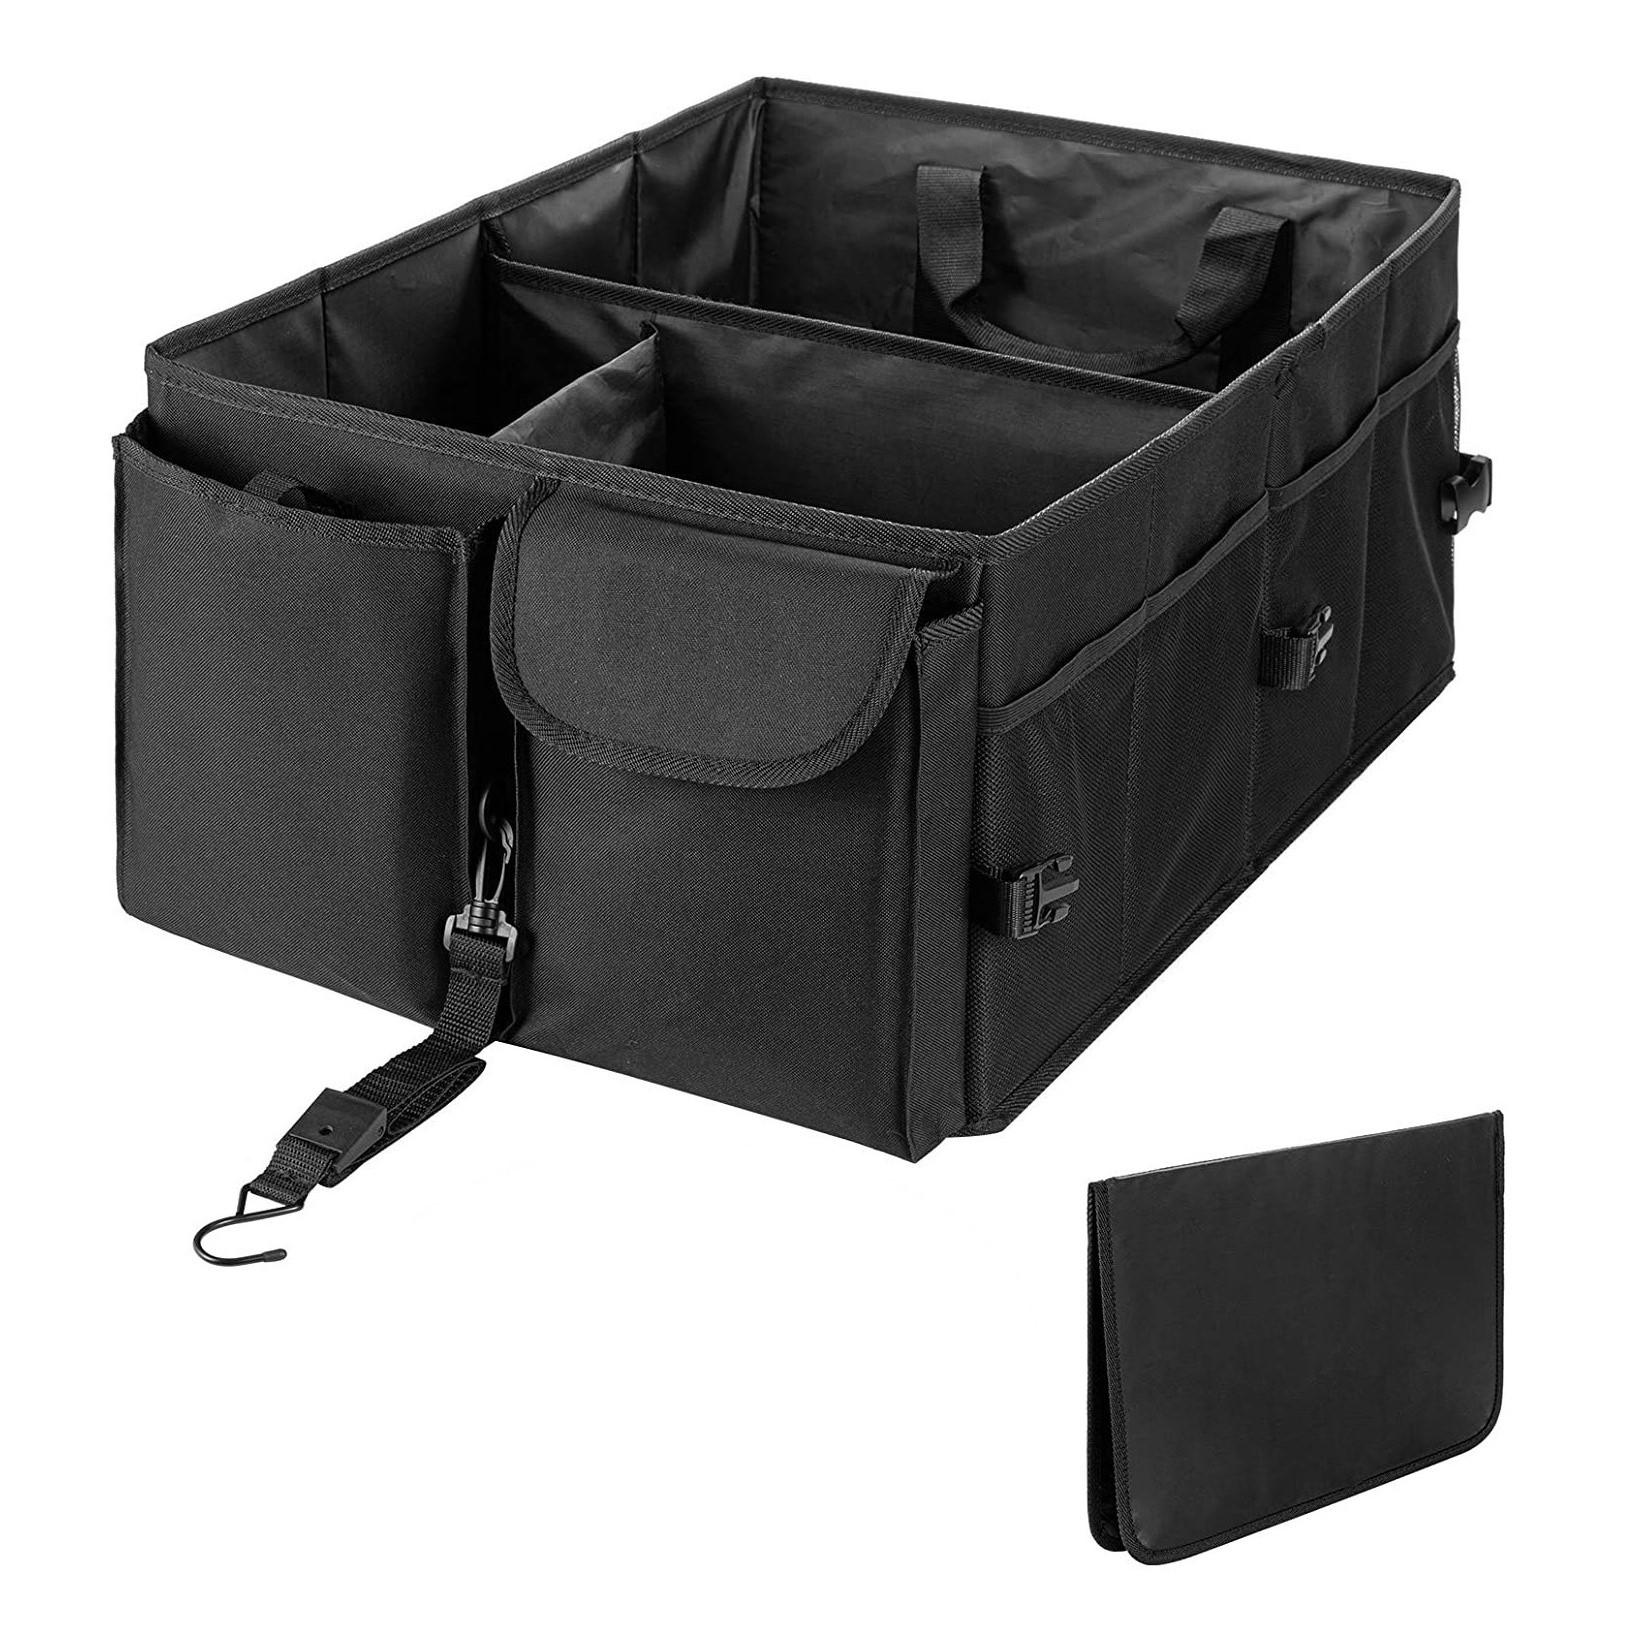 102088 Car Trunk Organizer Foldable Cargo Trunk Storage Organizer Featured Image